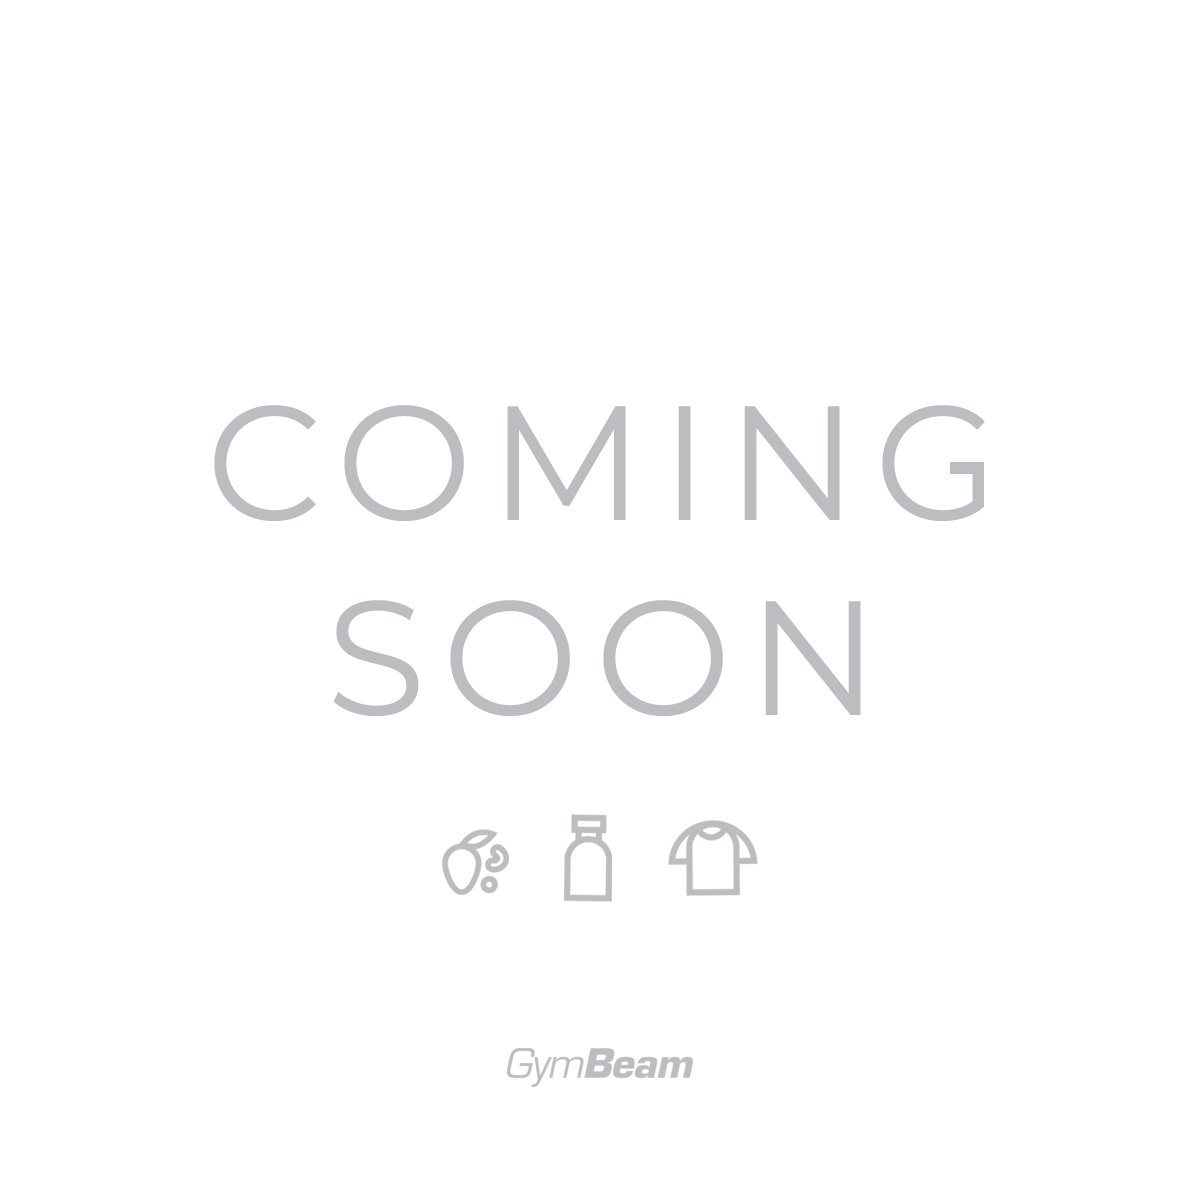 Hydrate & Perform - Isostar